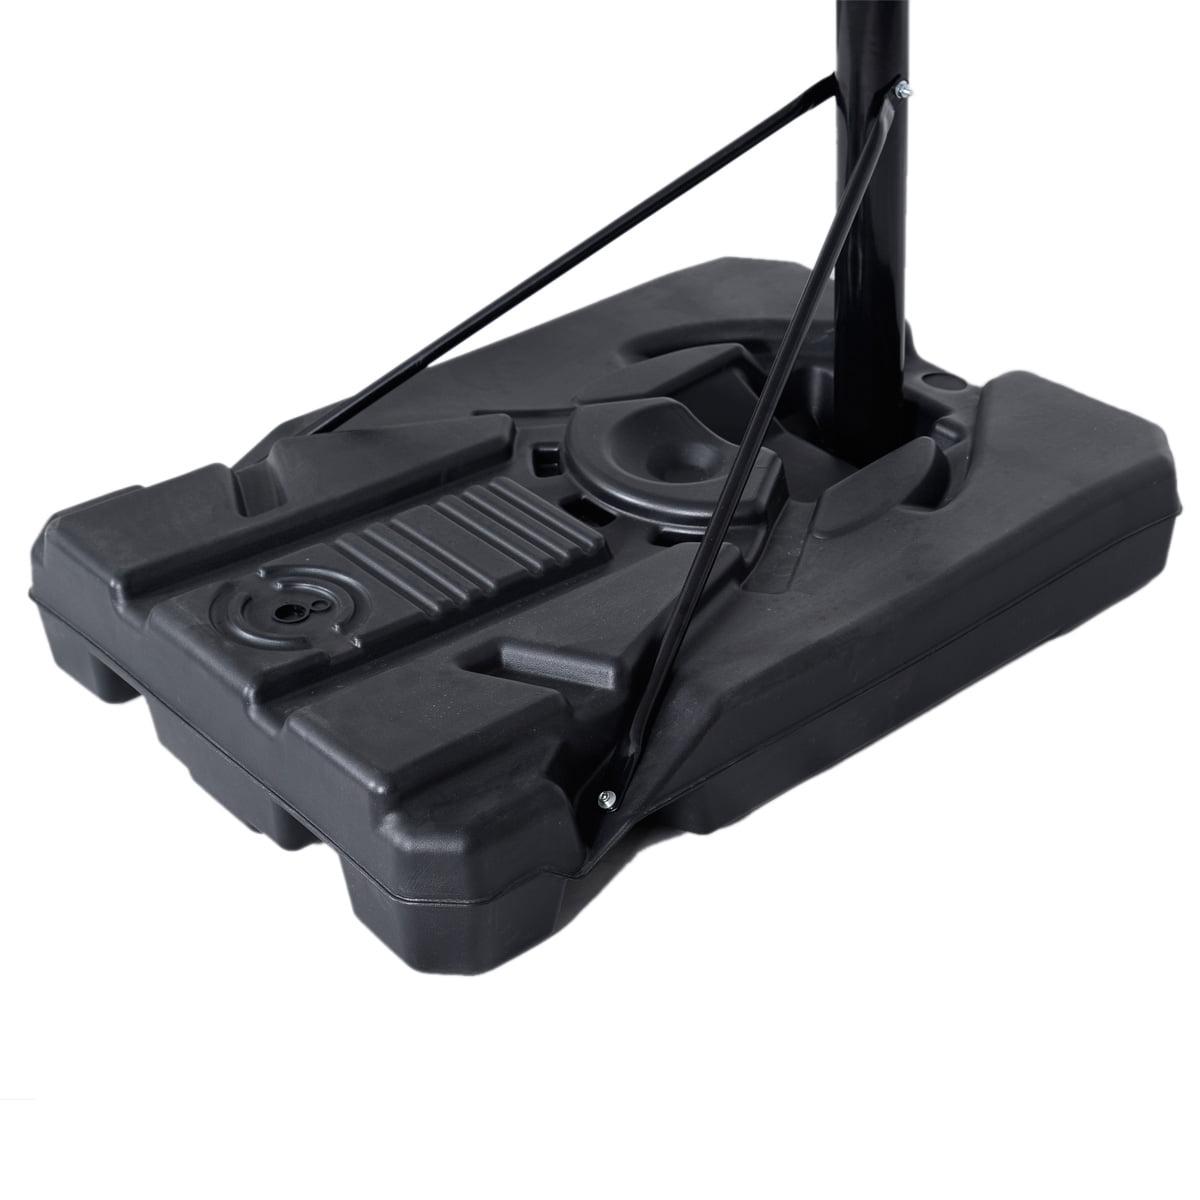 Goplus Indoor Outdoor 10' Adjustable Height Portable Basketball Hoop System  Backboard